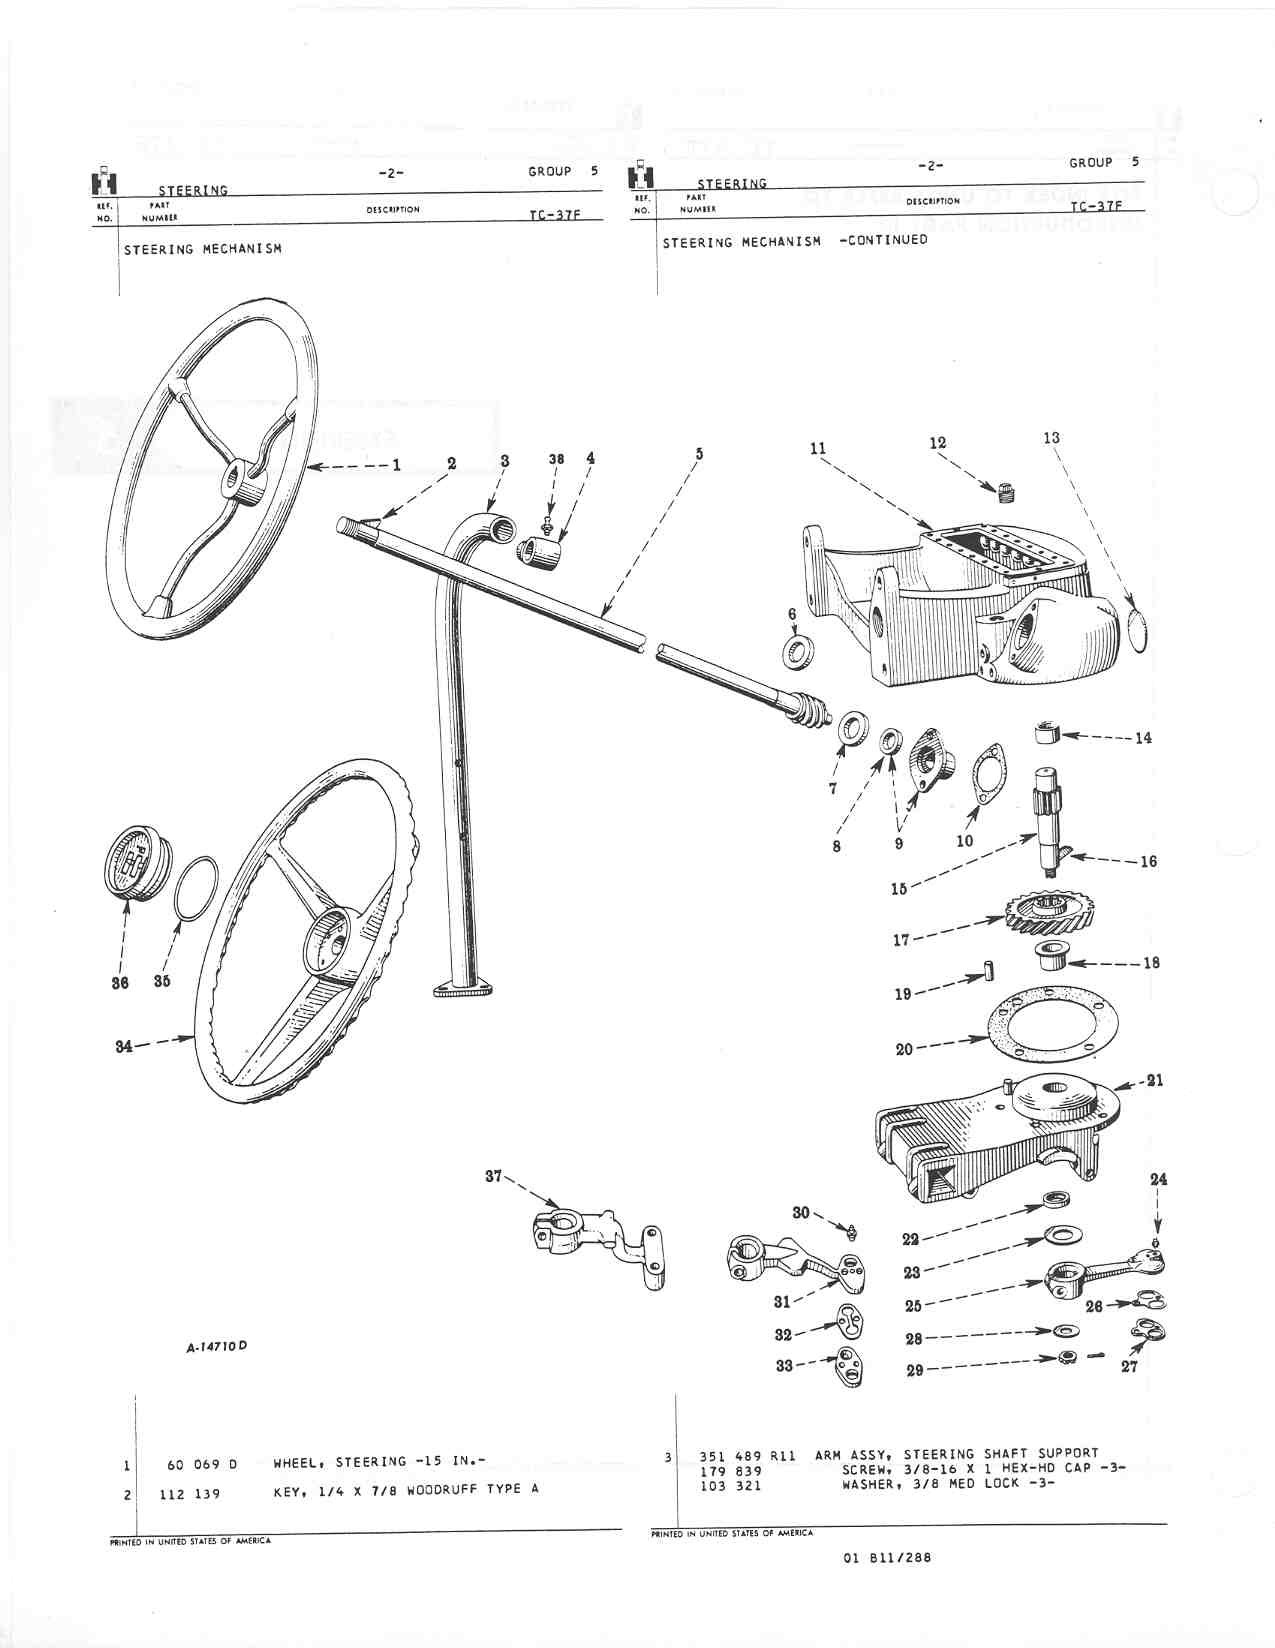 Farmall Cub Gear Box Diagram - Wiring Diagram & Cable Management on